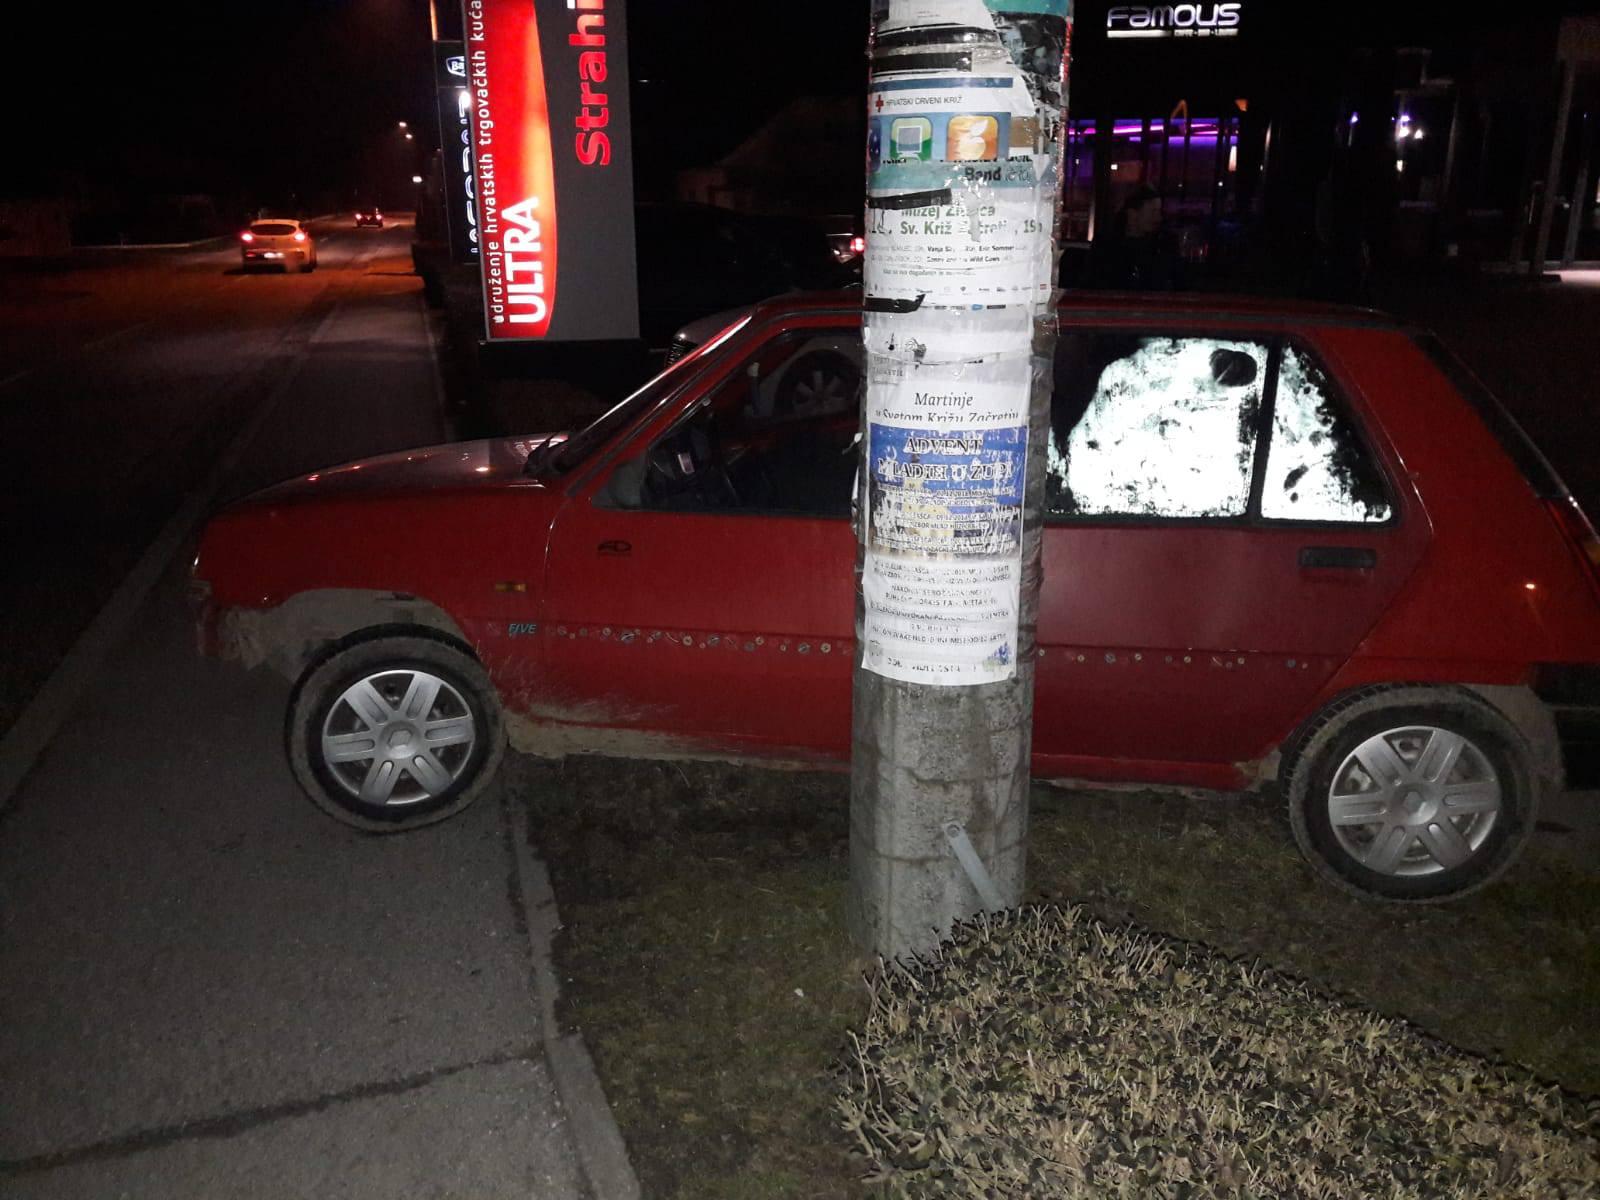 Autom oštetio izlog trgovine pa proletio kroz obližnju živicu